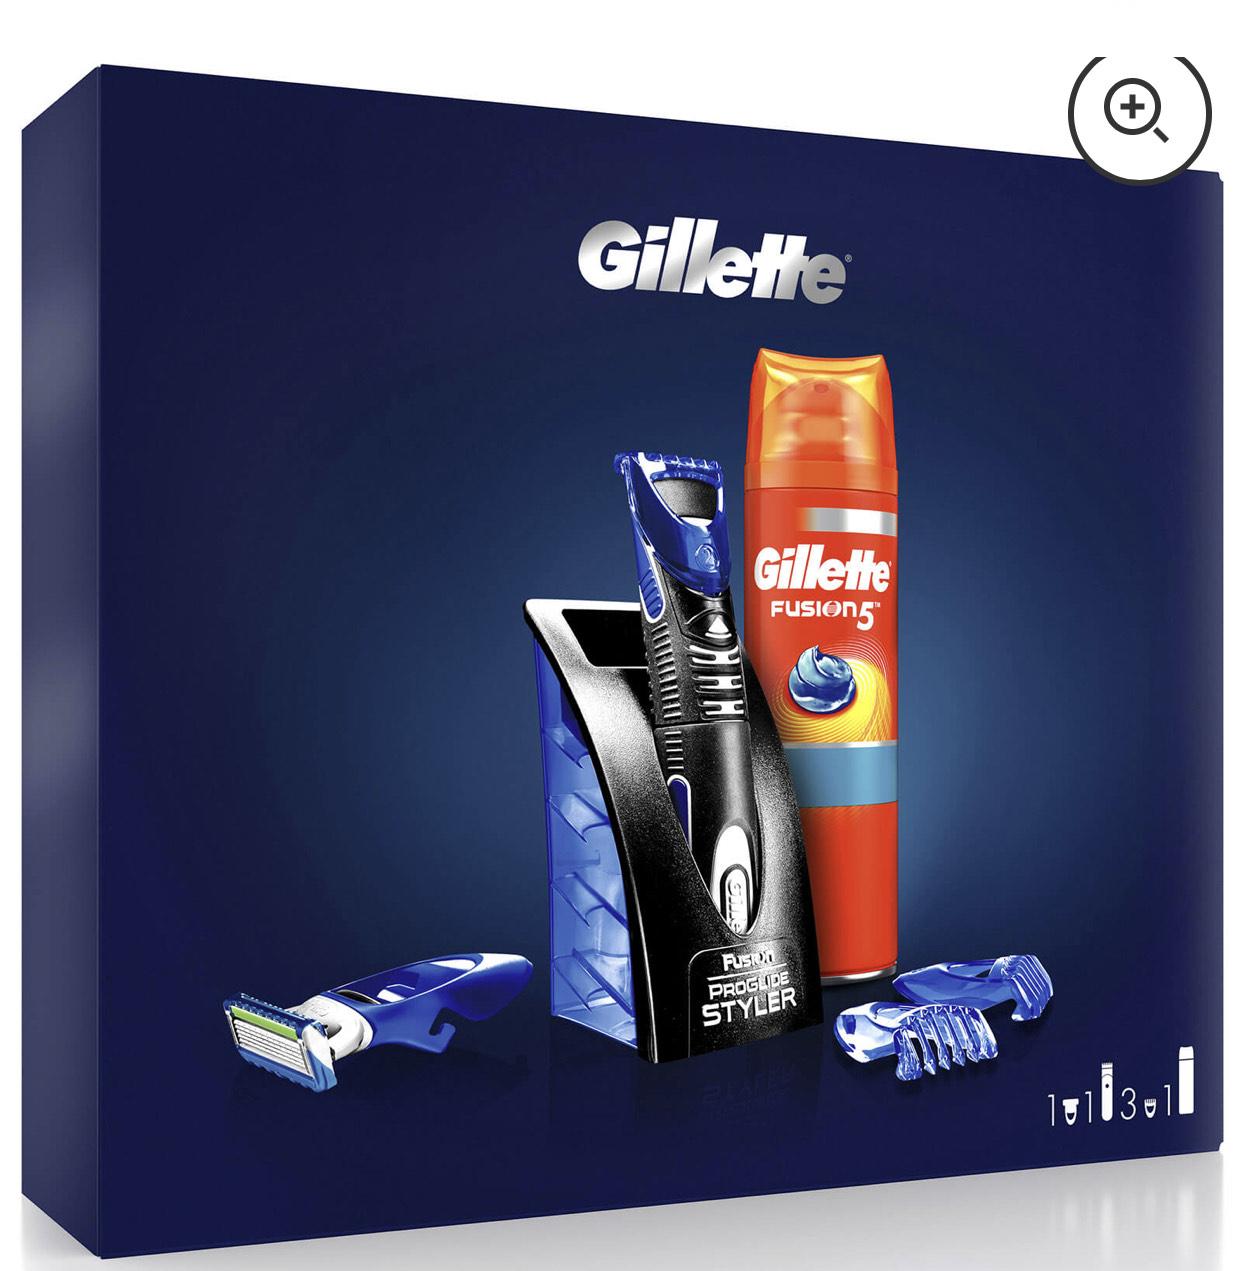 Gillette All Purpose Styler £14.06 Includes free Movember Comb @ Gillette